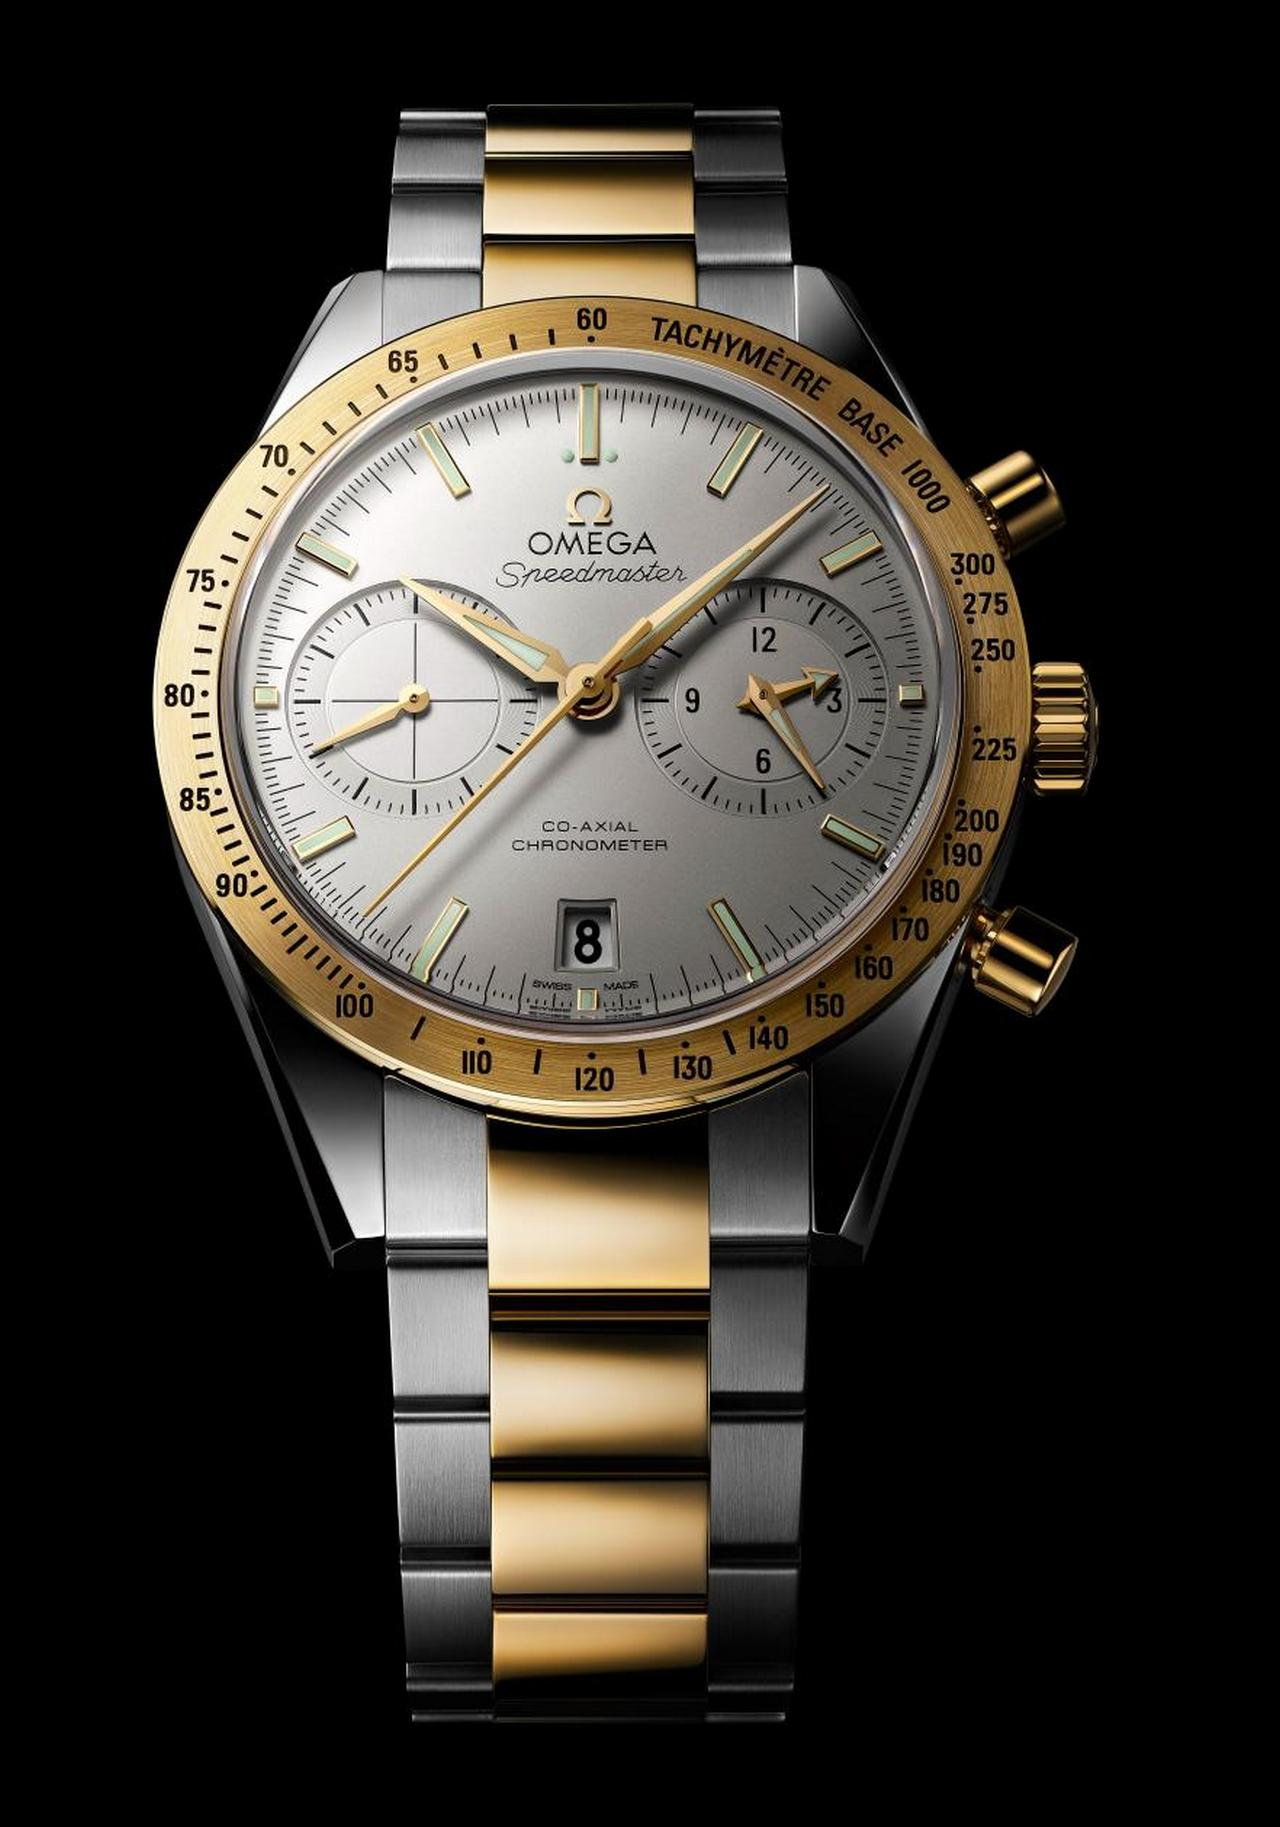 omega-speedmaster-57-co-axial-chronograph_0-100_160-100